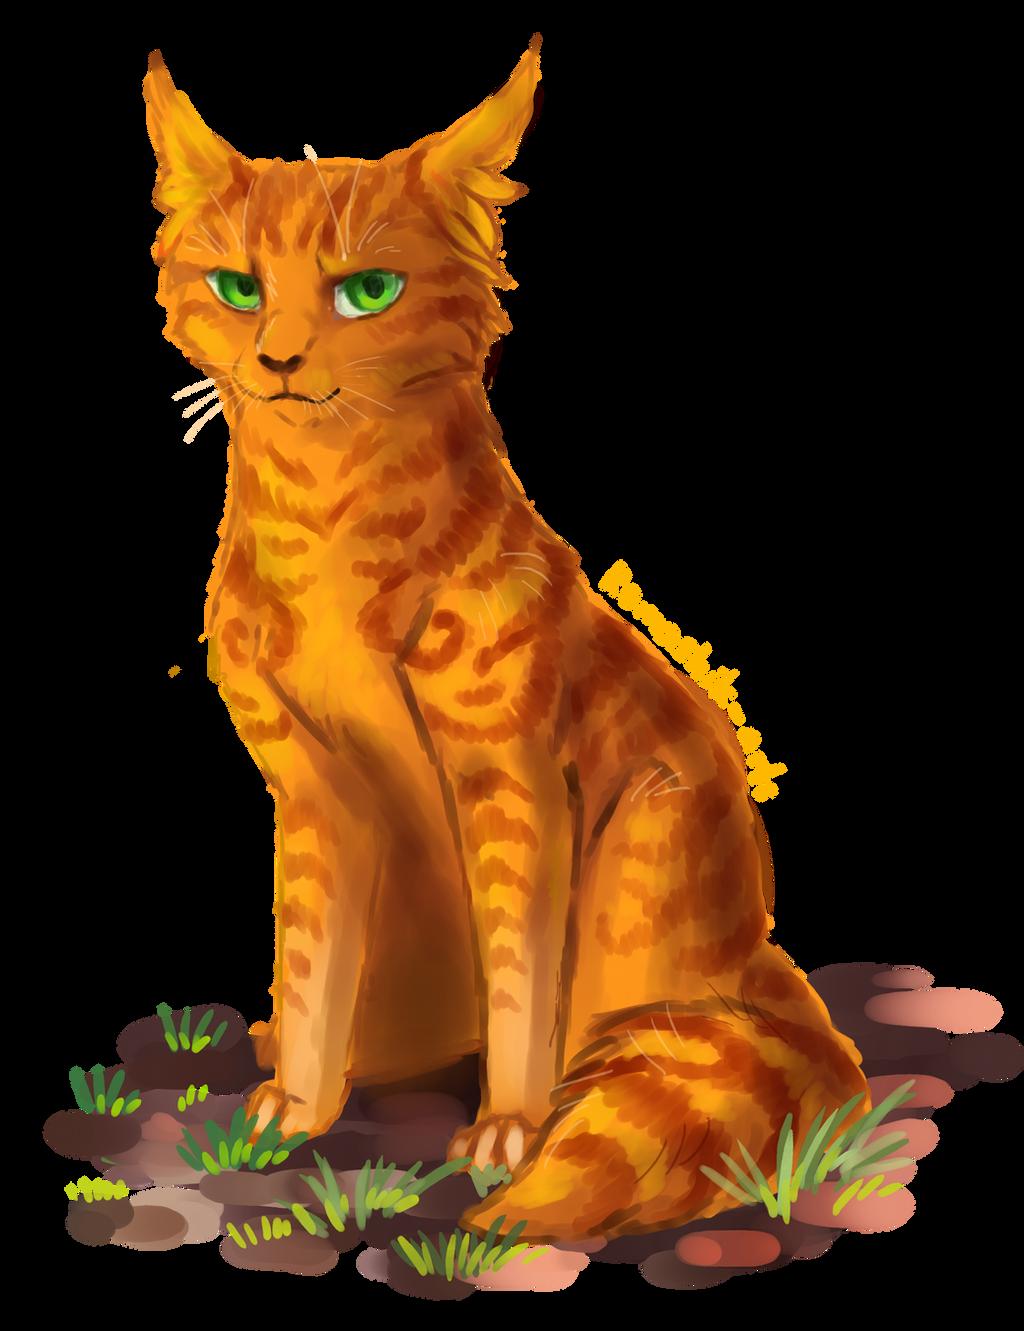 Firestar. Warriors by Romashik-arts on DeviantArt Warrior Cat Drawings Firestar